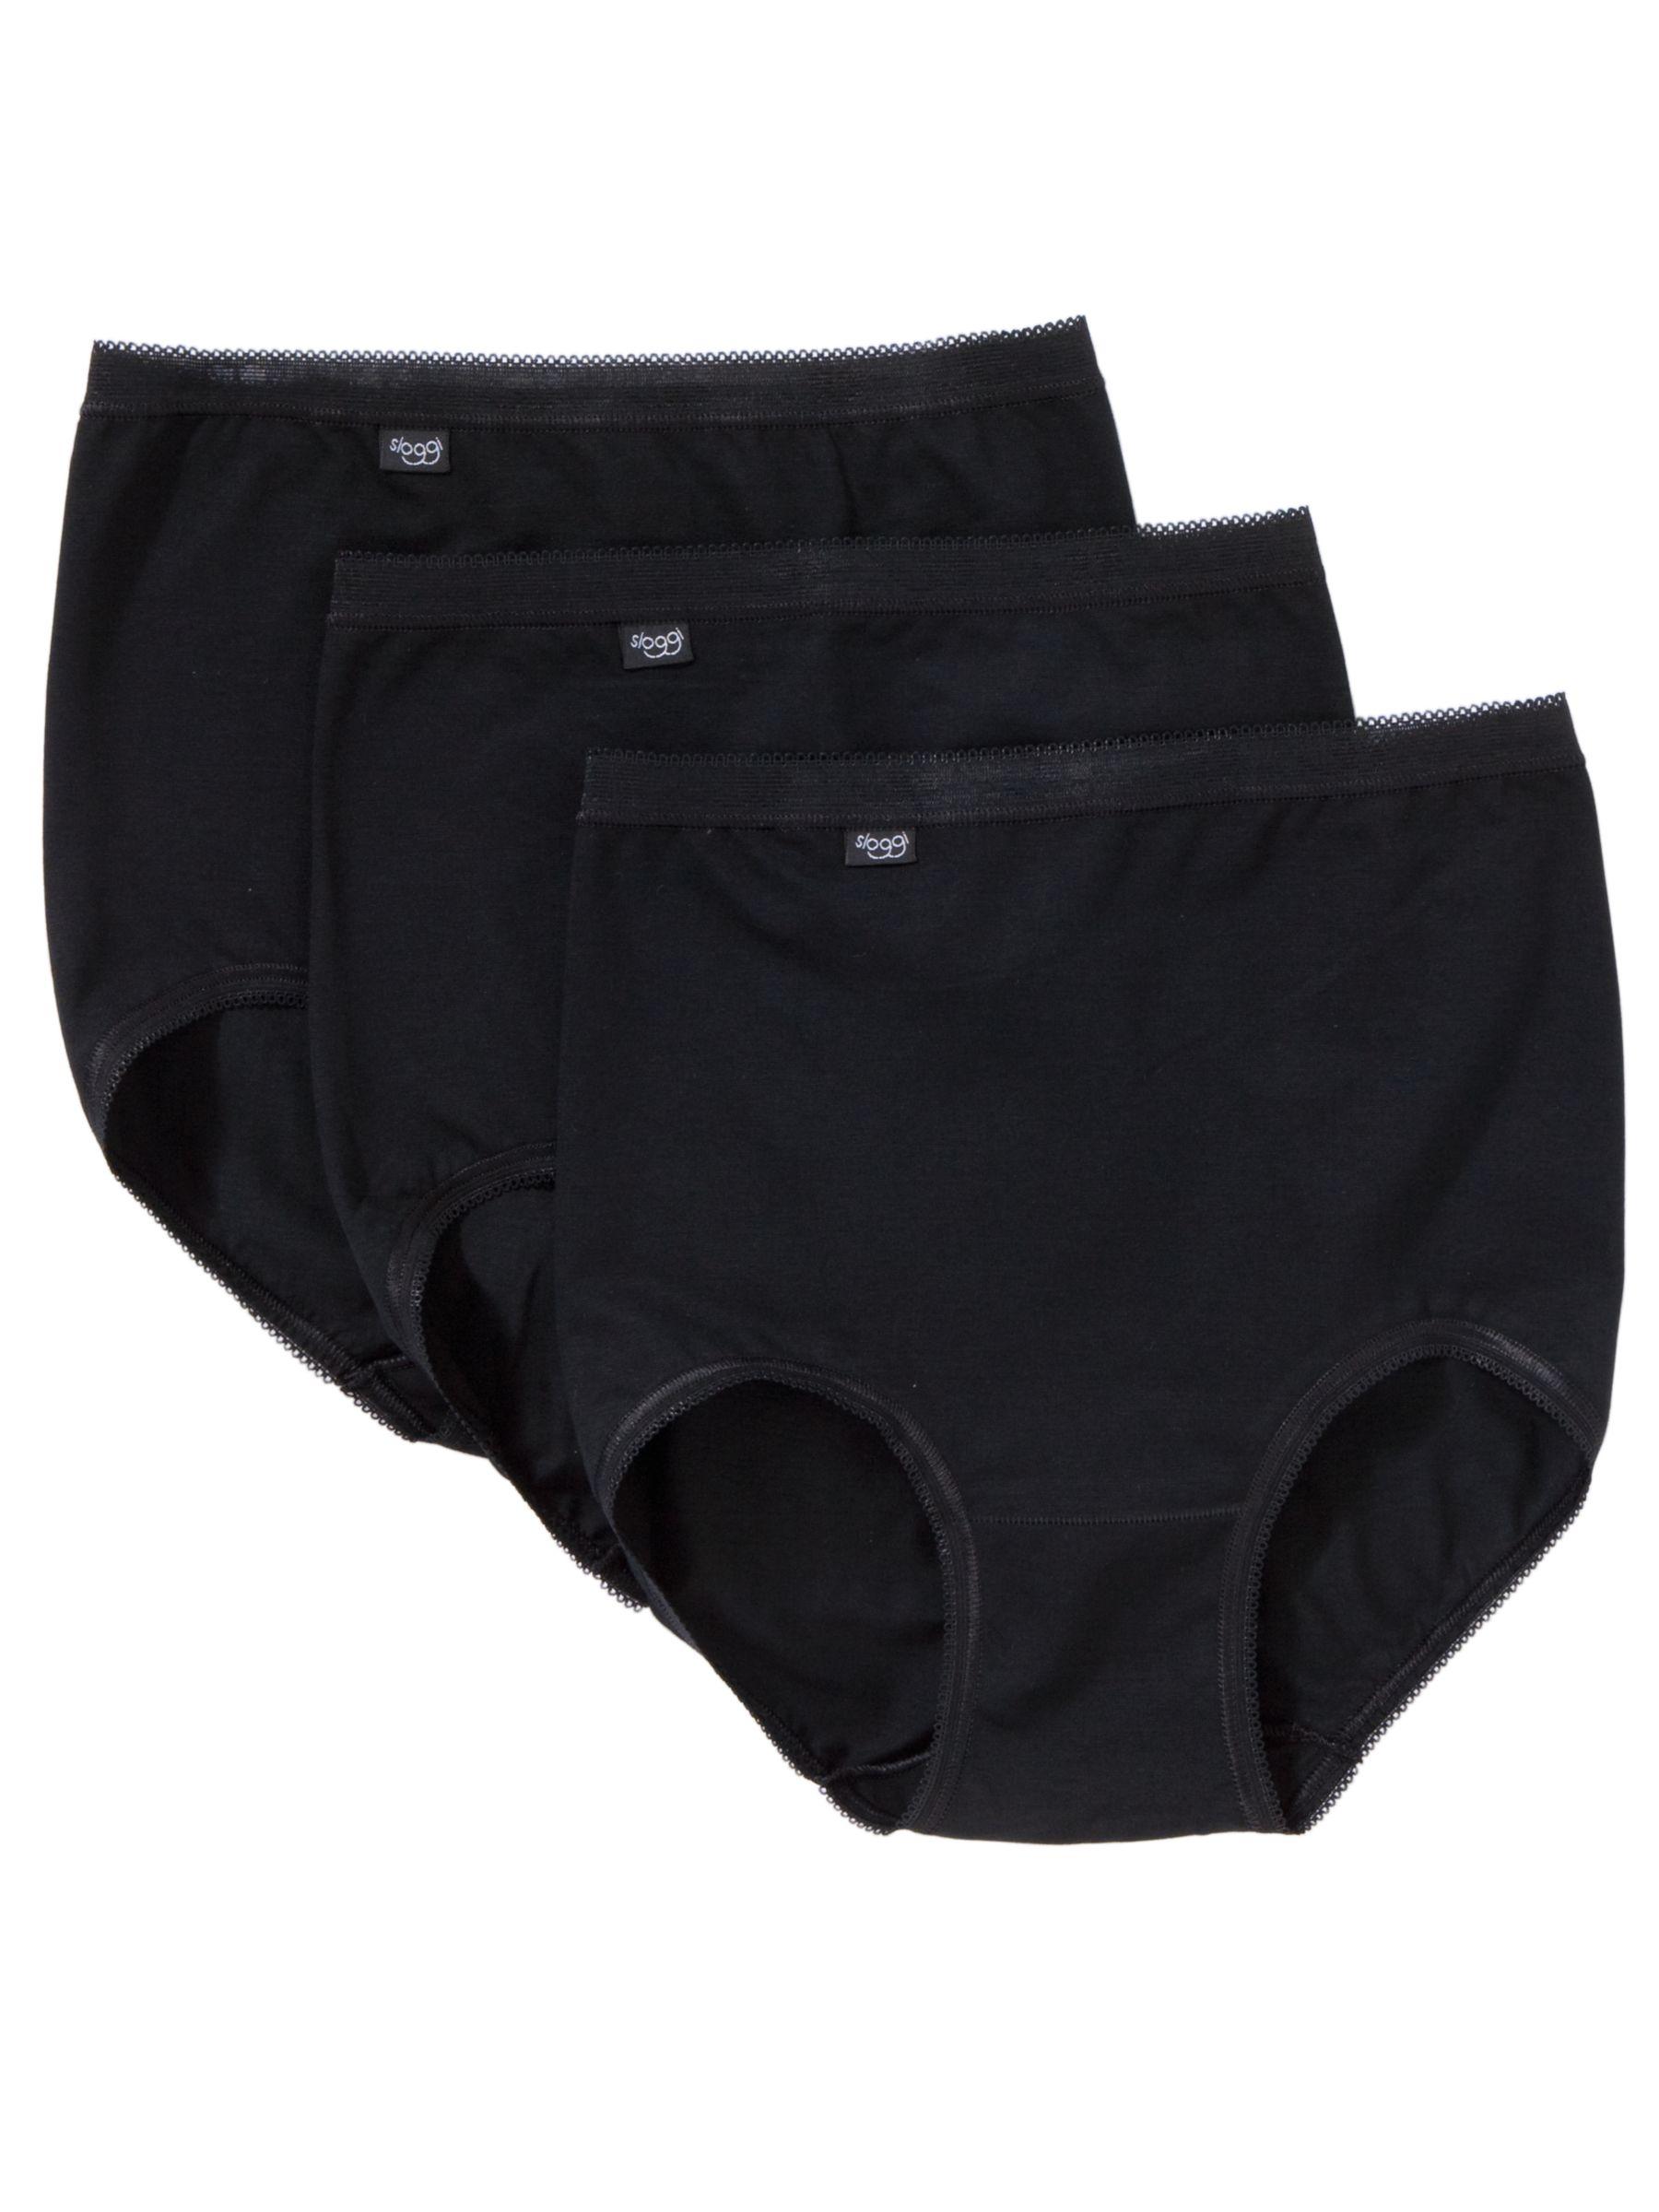 Sloggi sloggi 3 Pack Maxi Pants